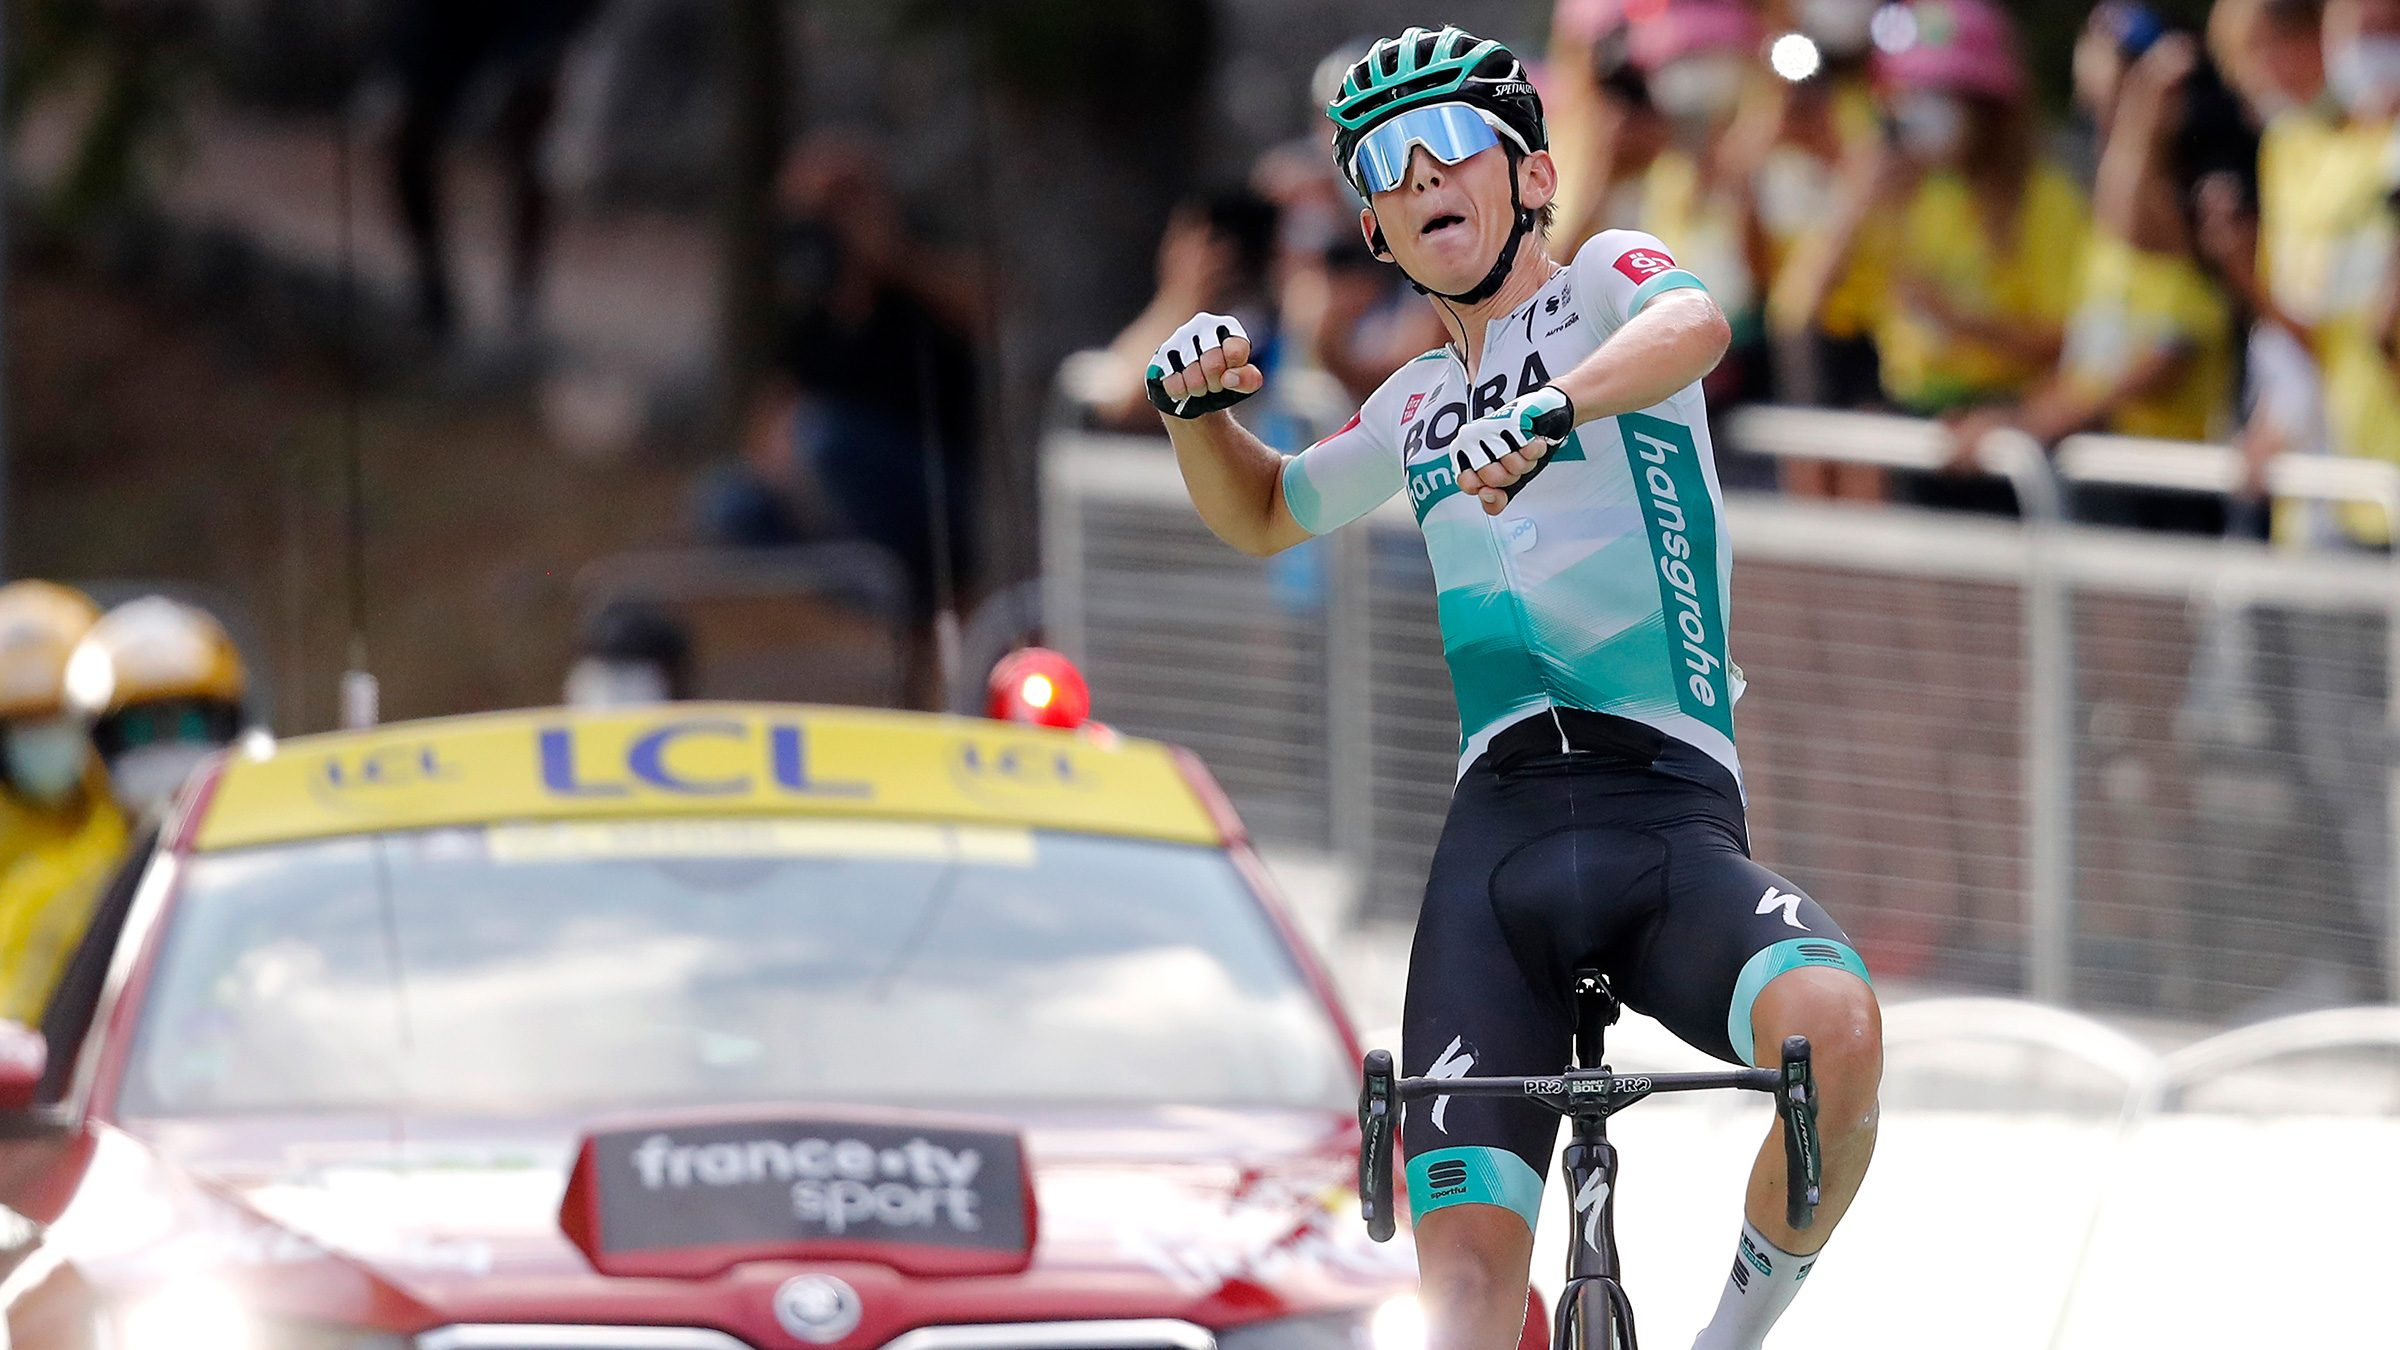 Lennard Kamna Stage 16 Le Tour de France